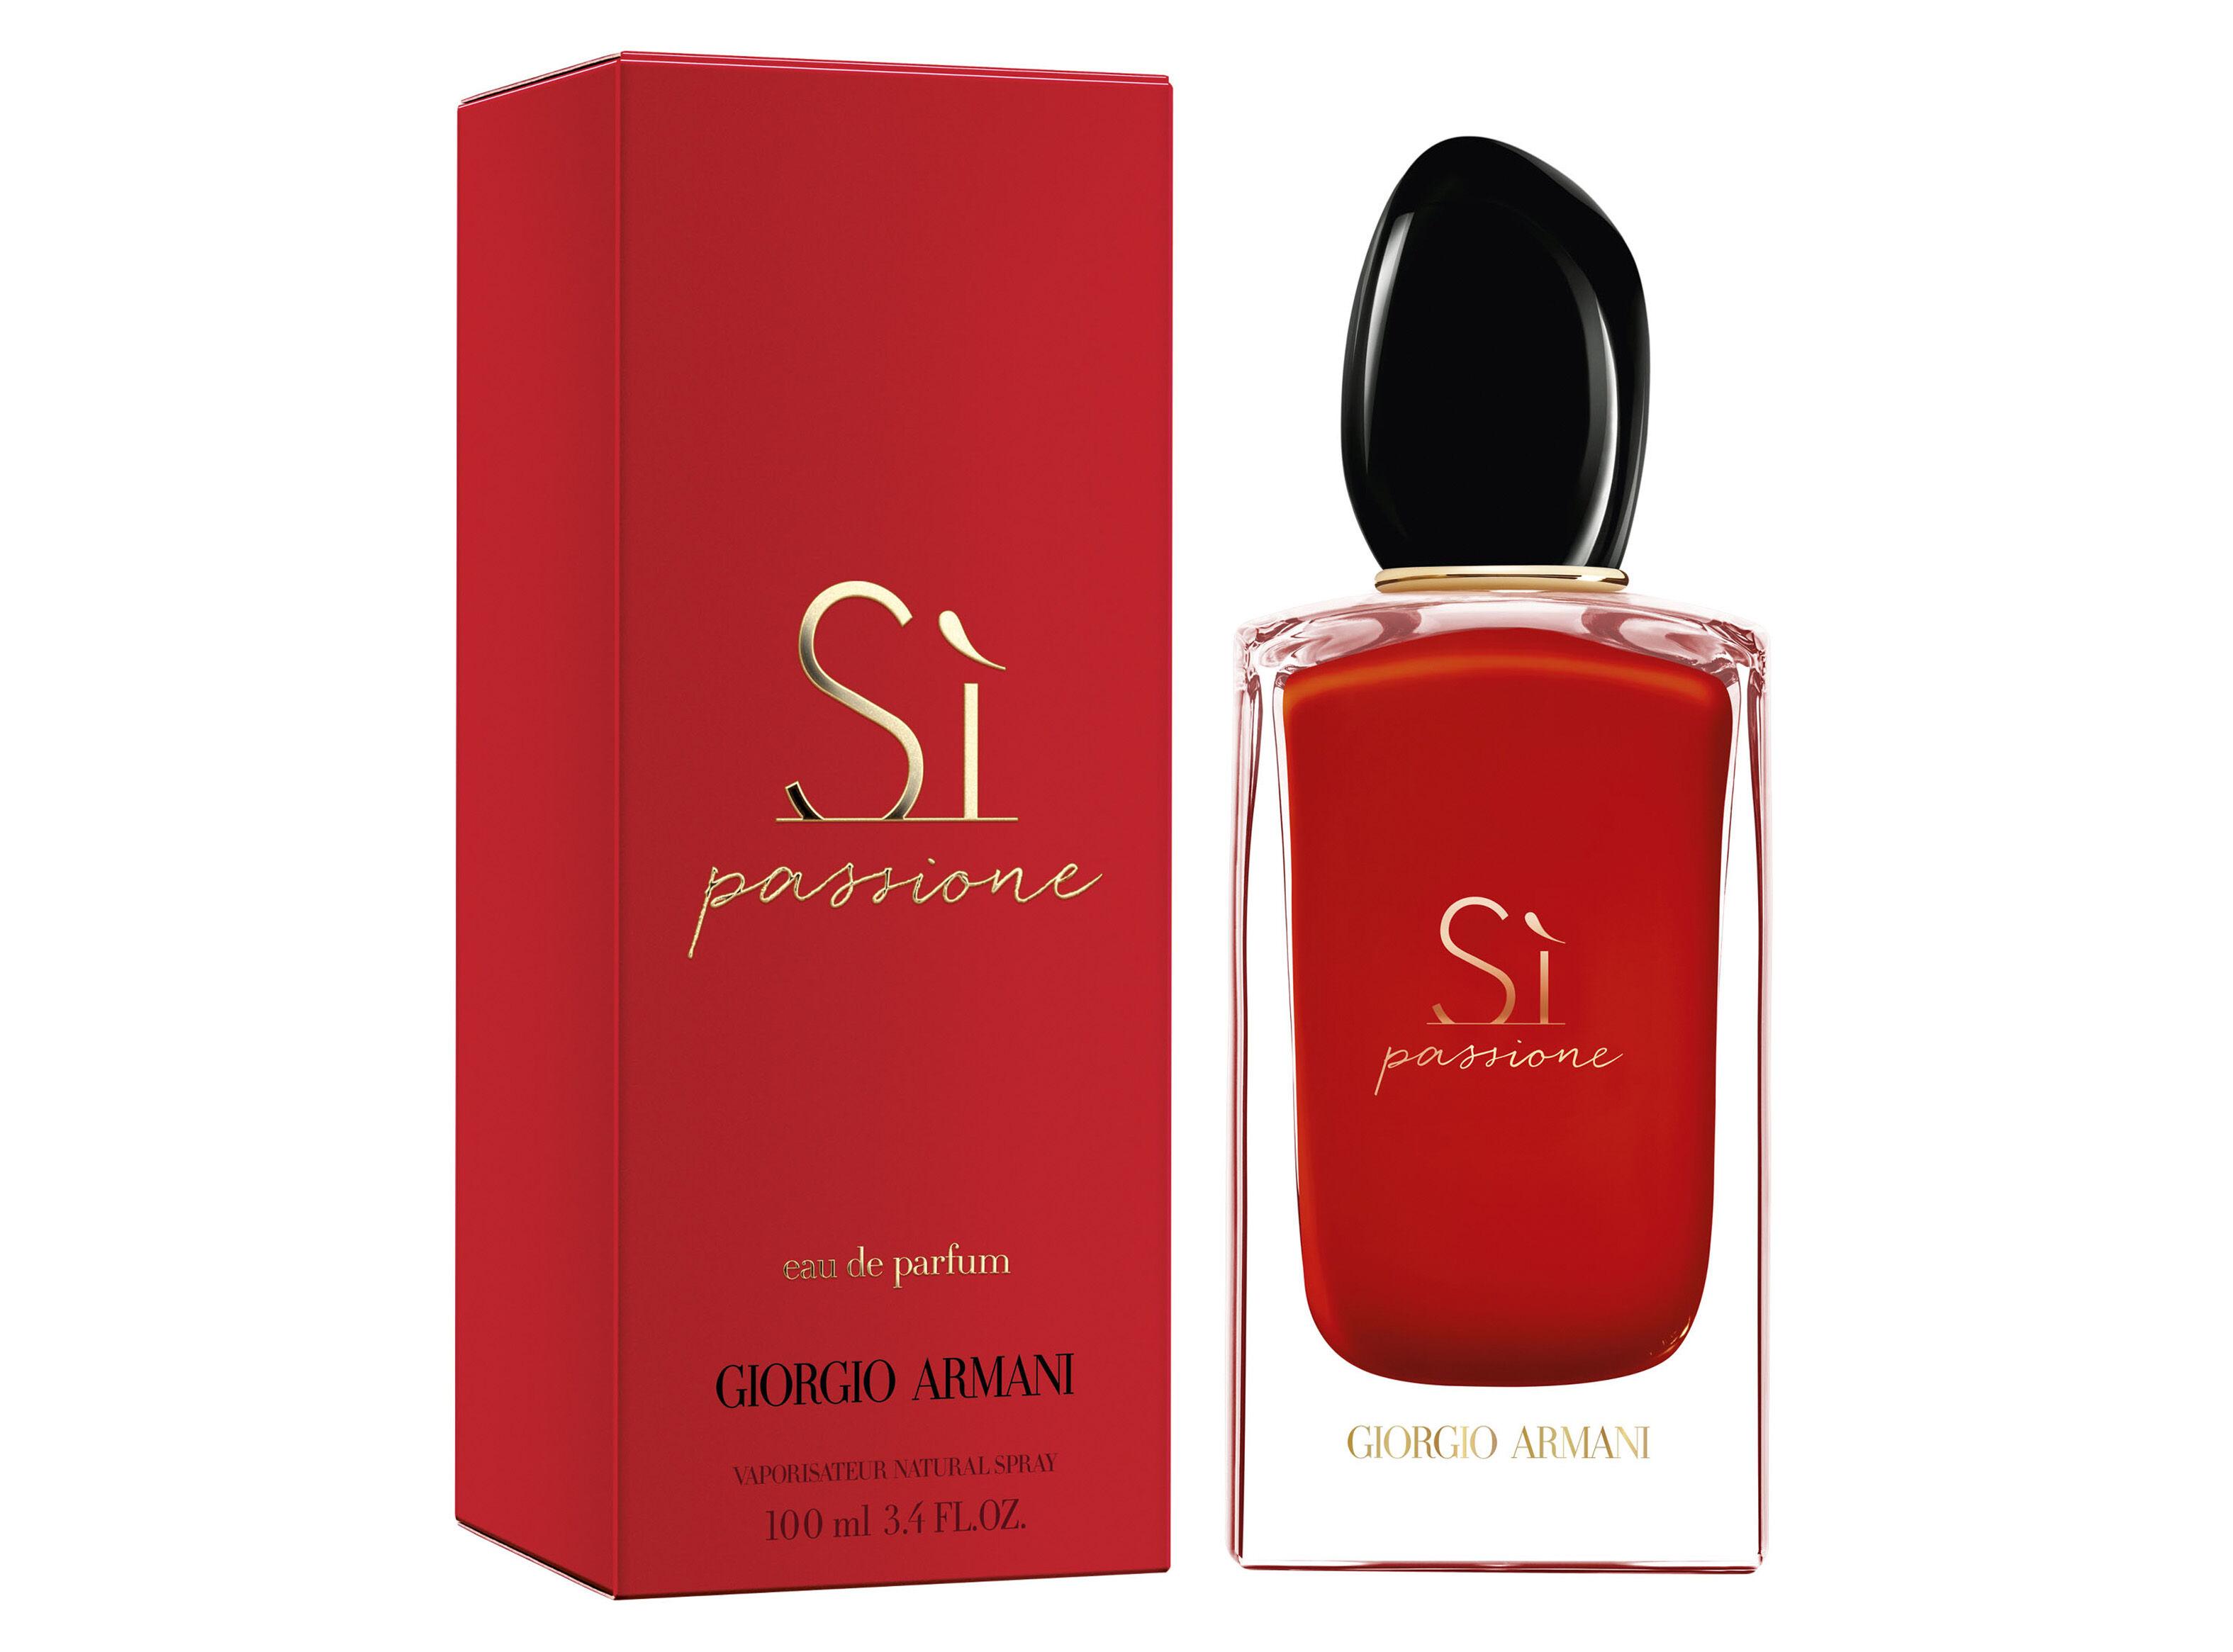 MujerParis Edp Perfumes Passione 100 Armani Sí Ml En Perfume Giorgio wPZikuXTlO